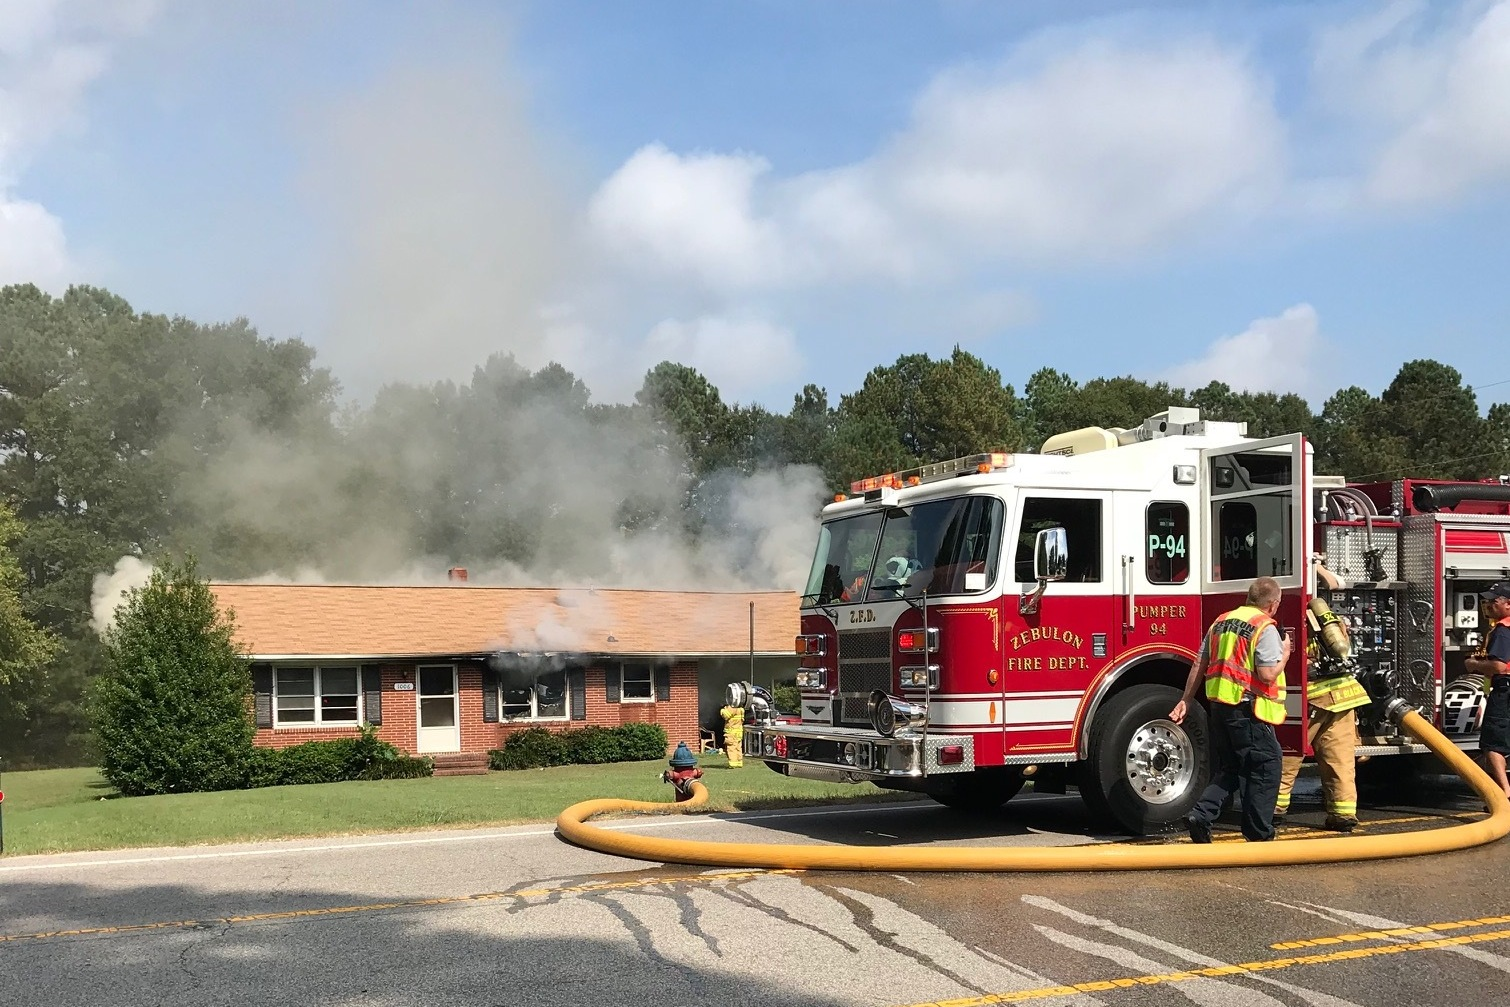 Pumper 94 at Structure Fire